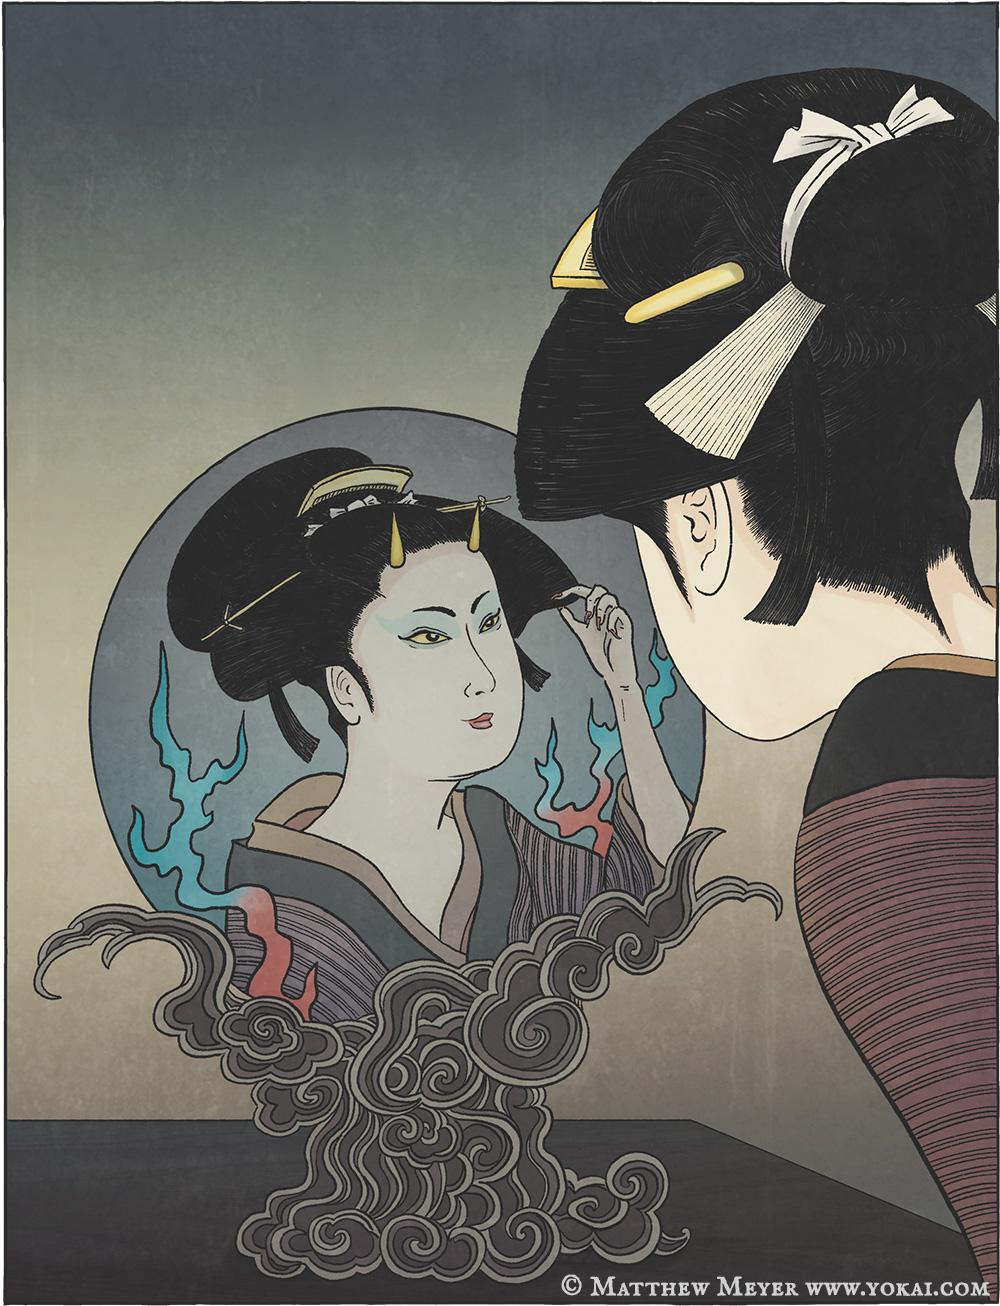 Raiju Yokai – By kanigaro, posted 6 years ago digital artist.